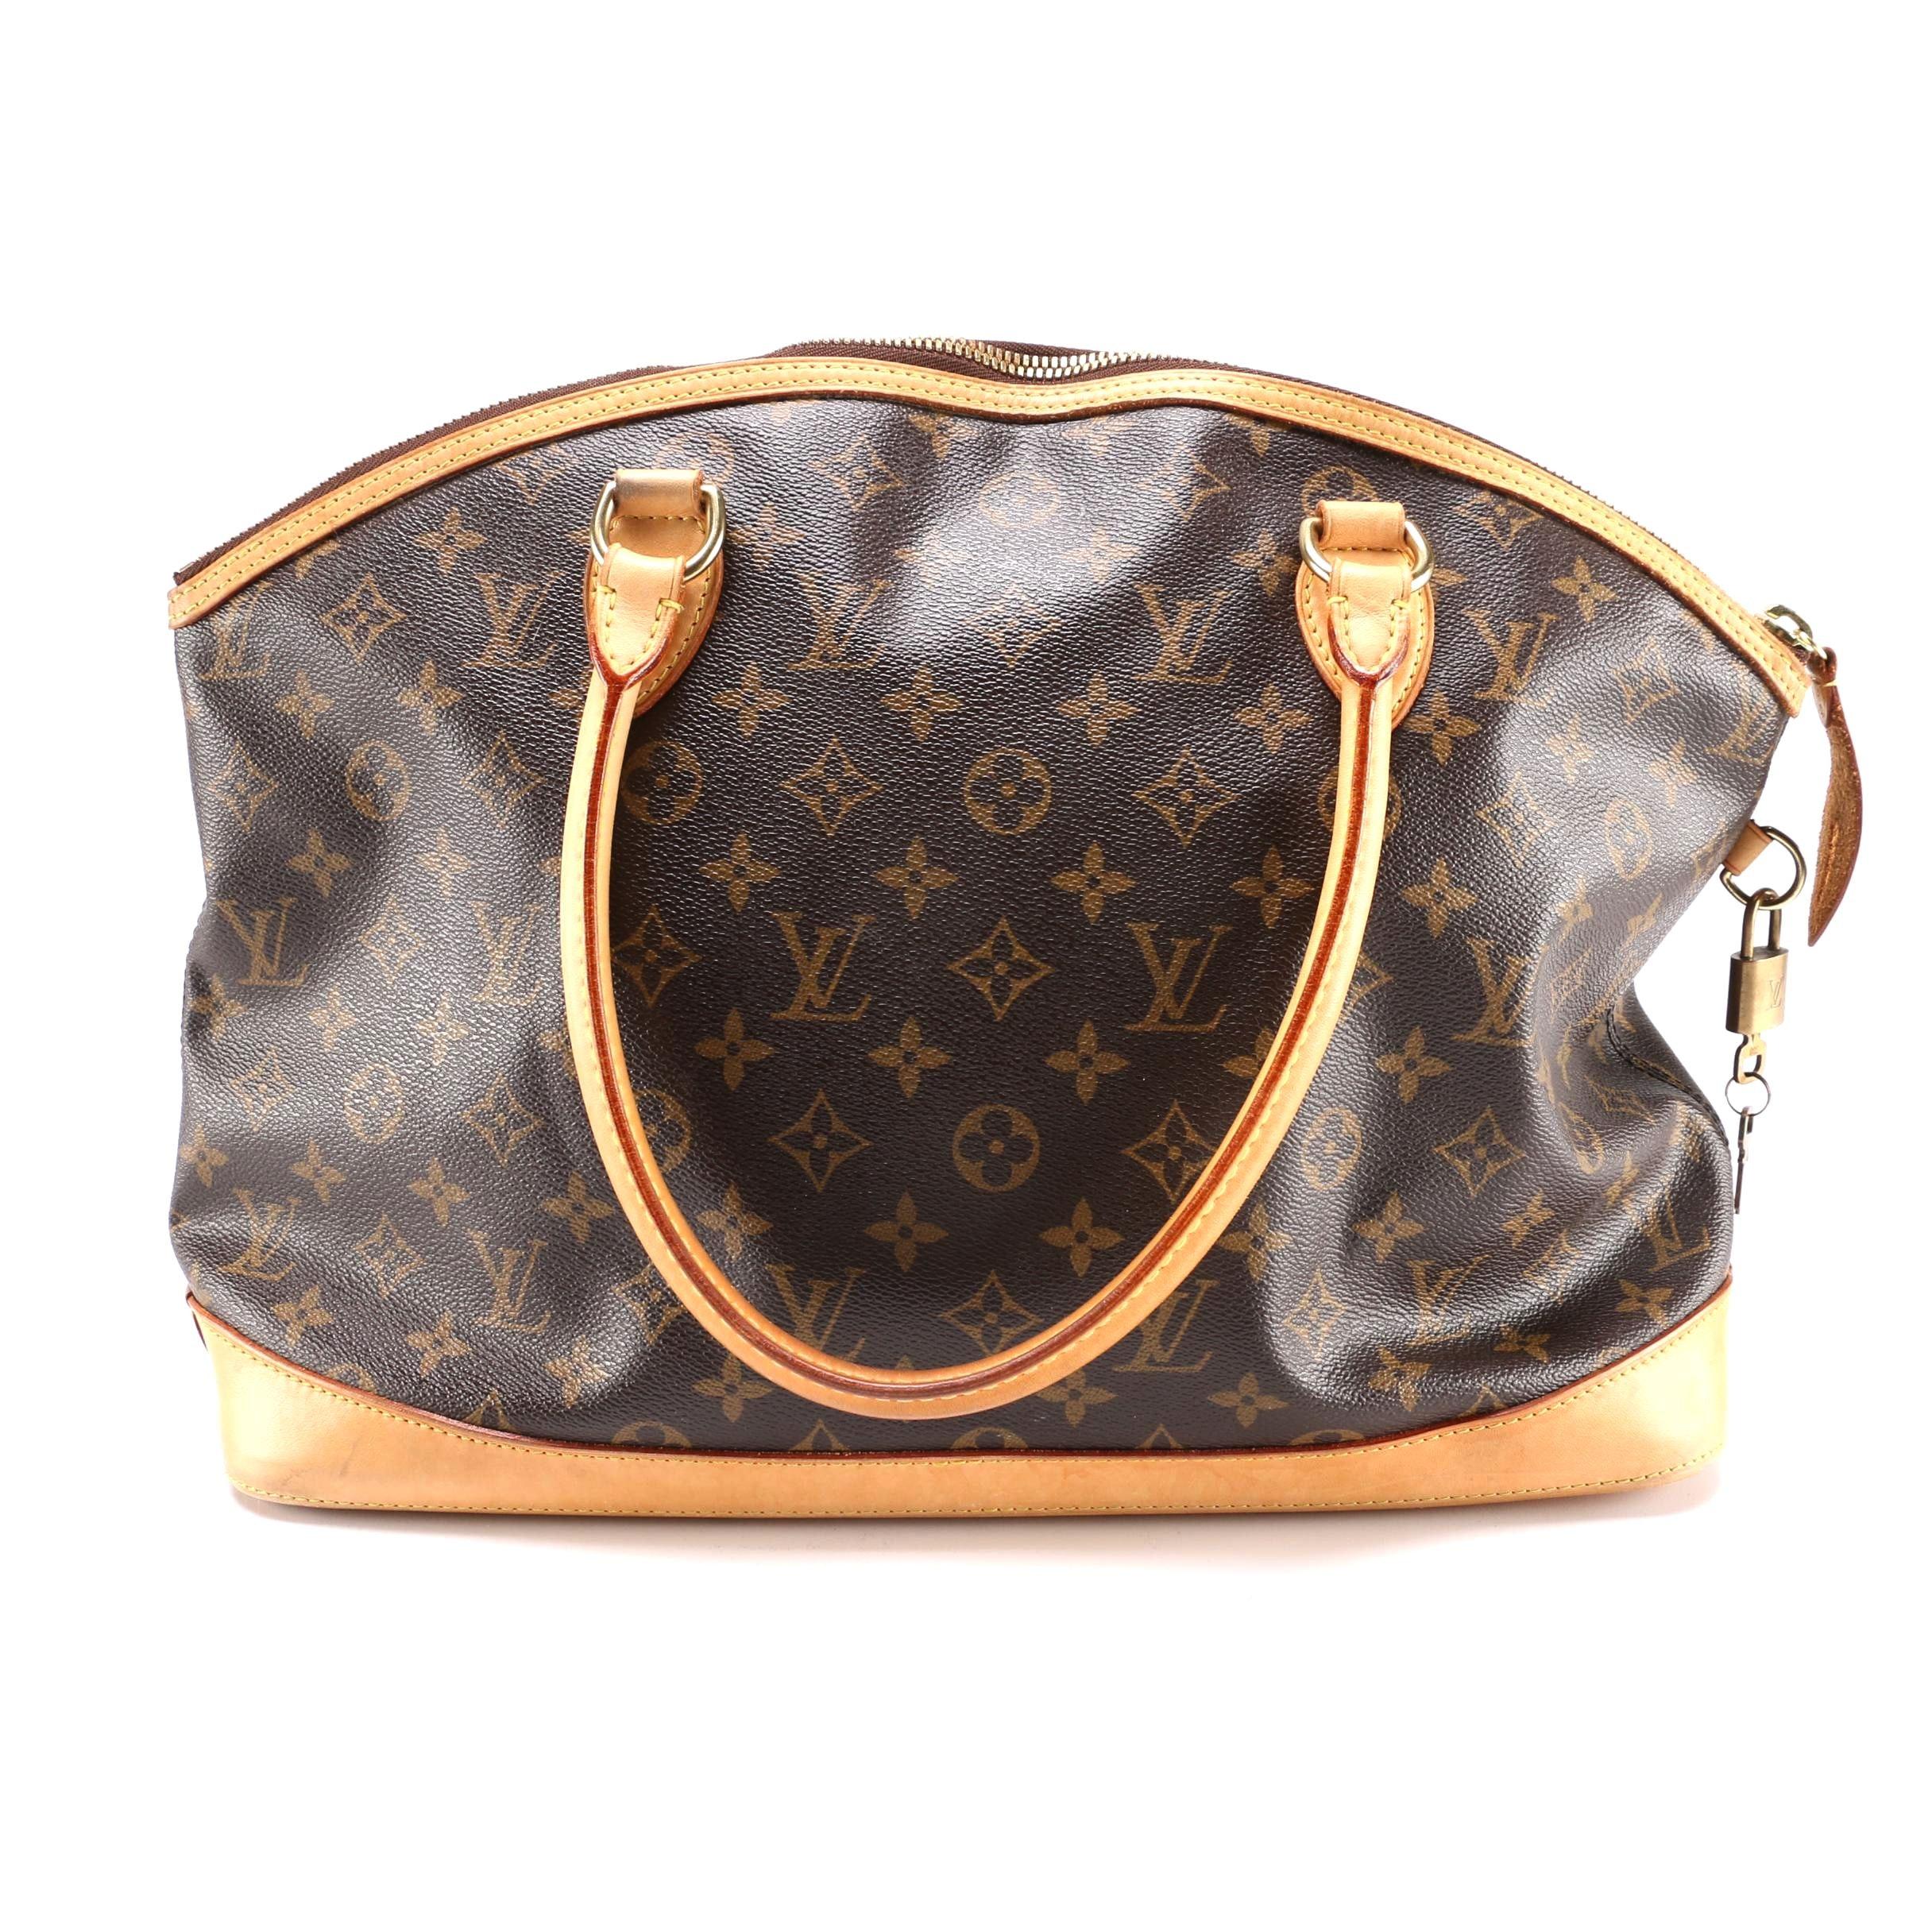 Louis Vuitton Monogram Lockit Horizontal Handbag